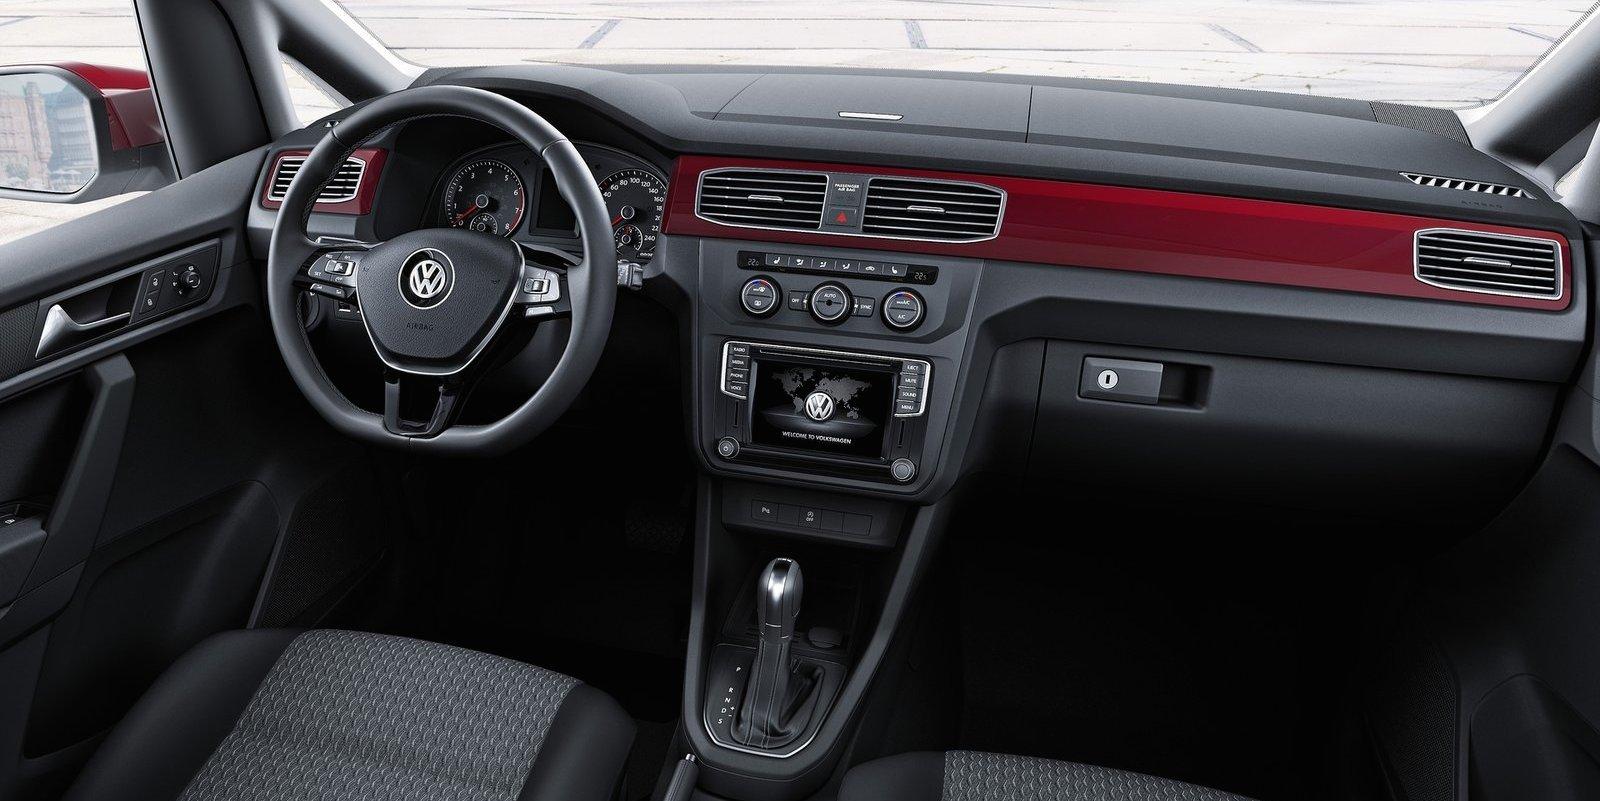 2016 Volkswagen Caddy Revealed - Photos